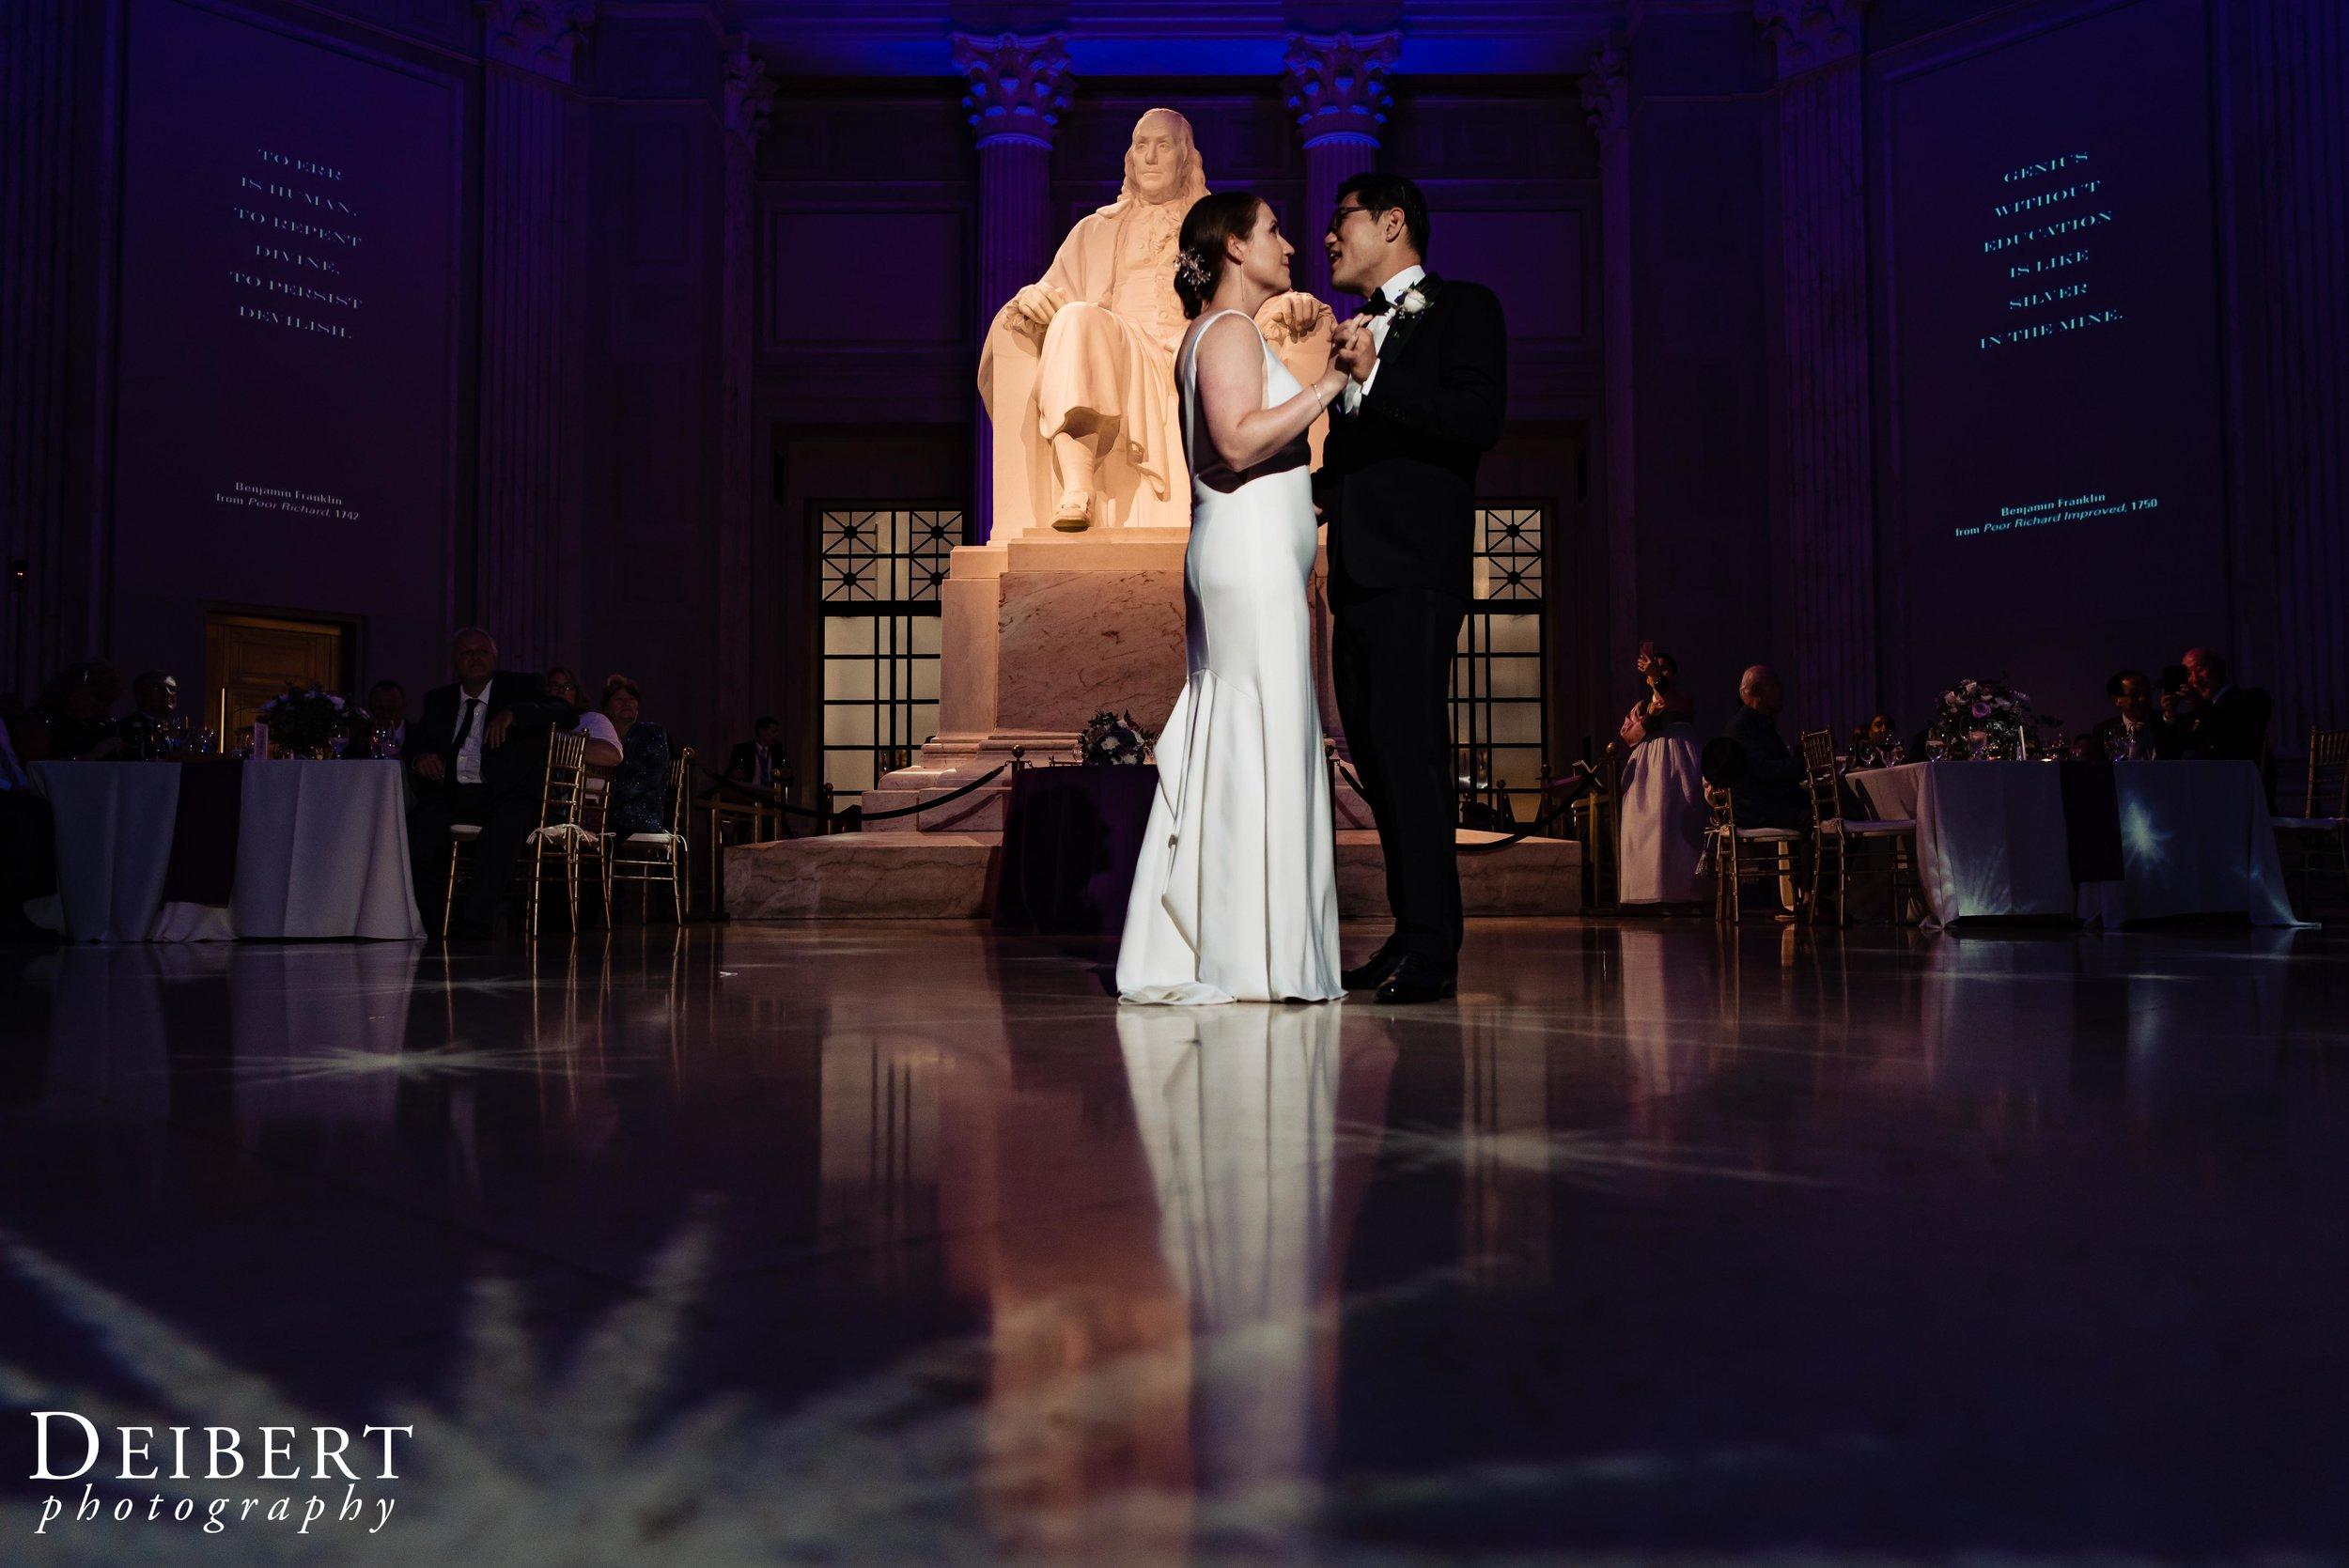 Franklin Institue Philadelphia Wedding-109.jpg